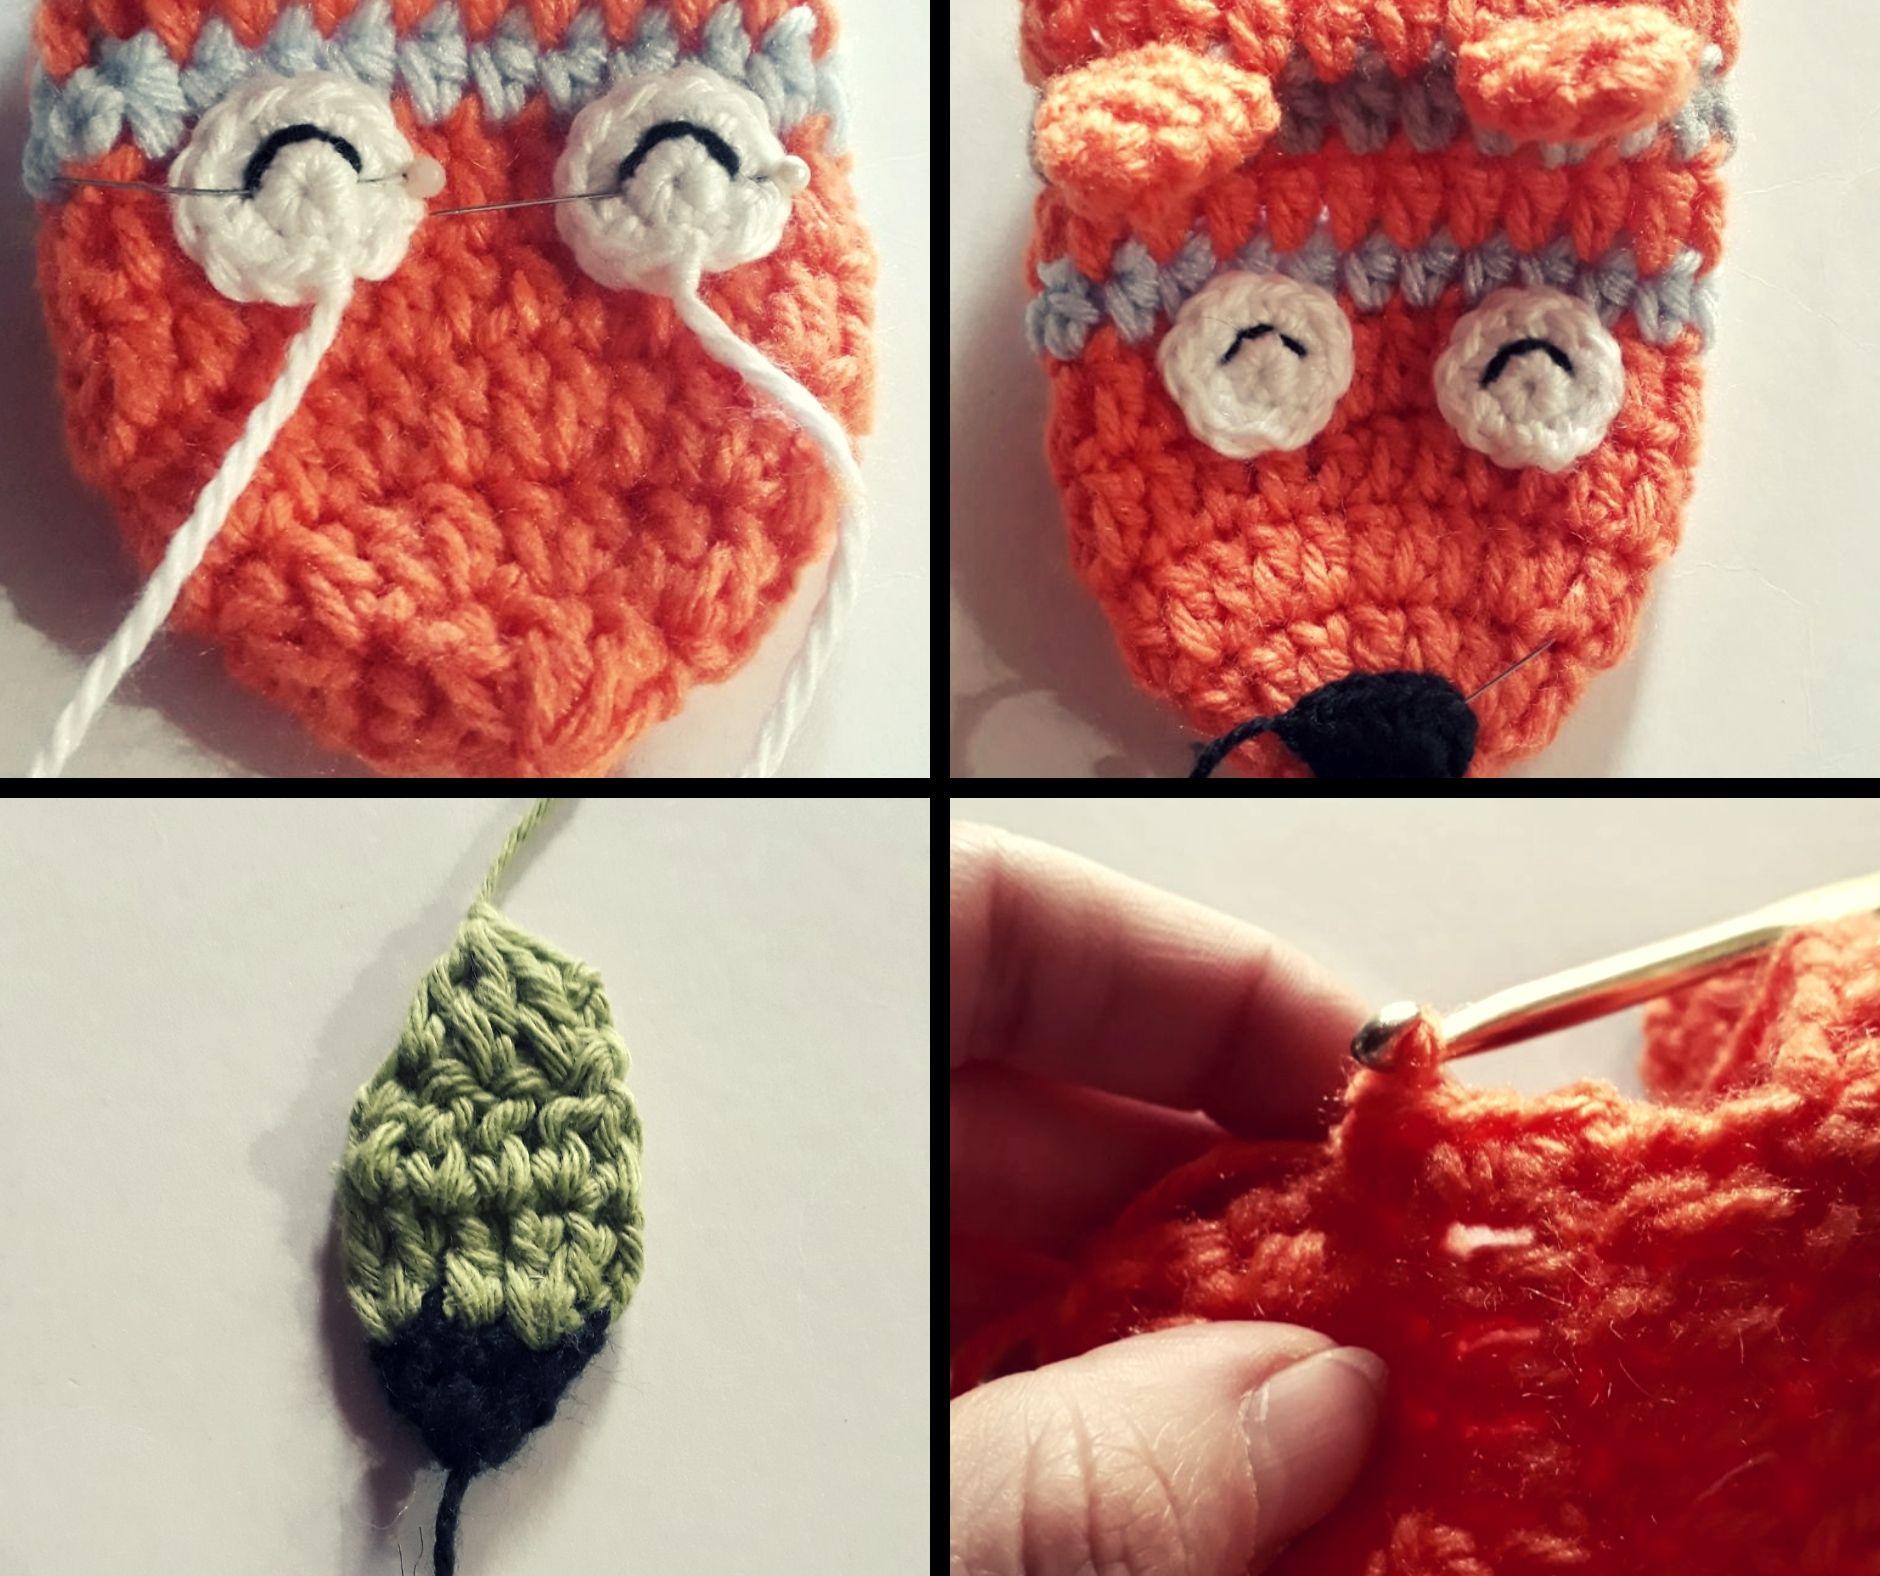 tutorial pantuflas zorro a crochet paso a paso para niños